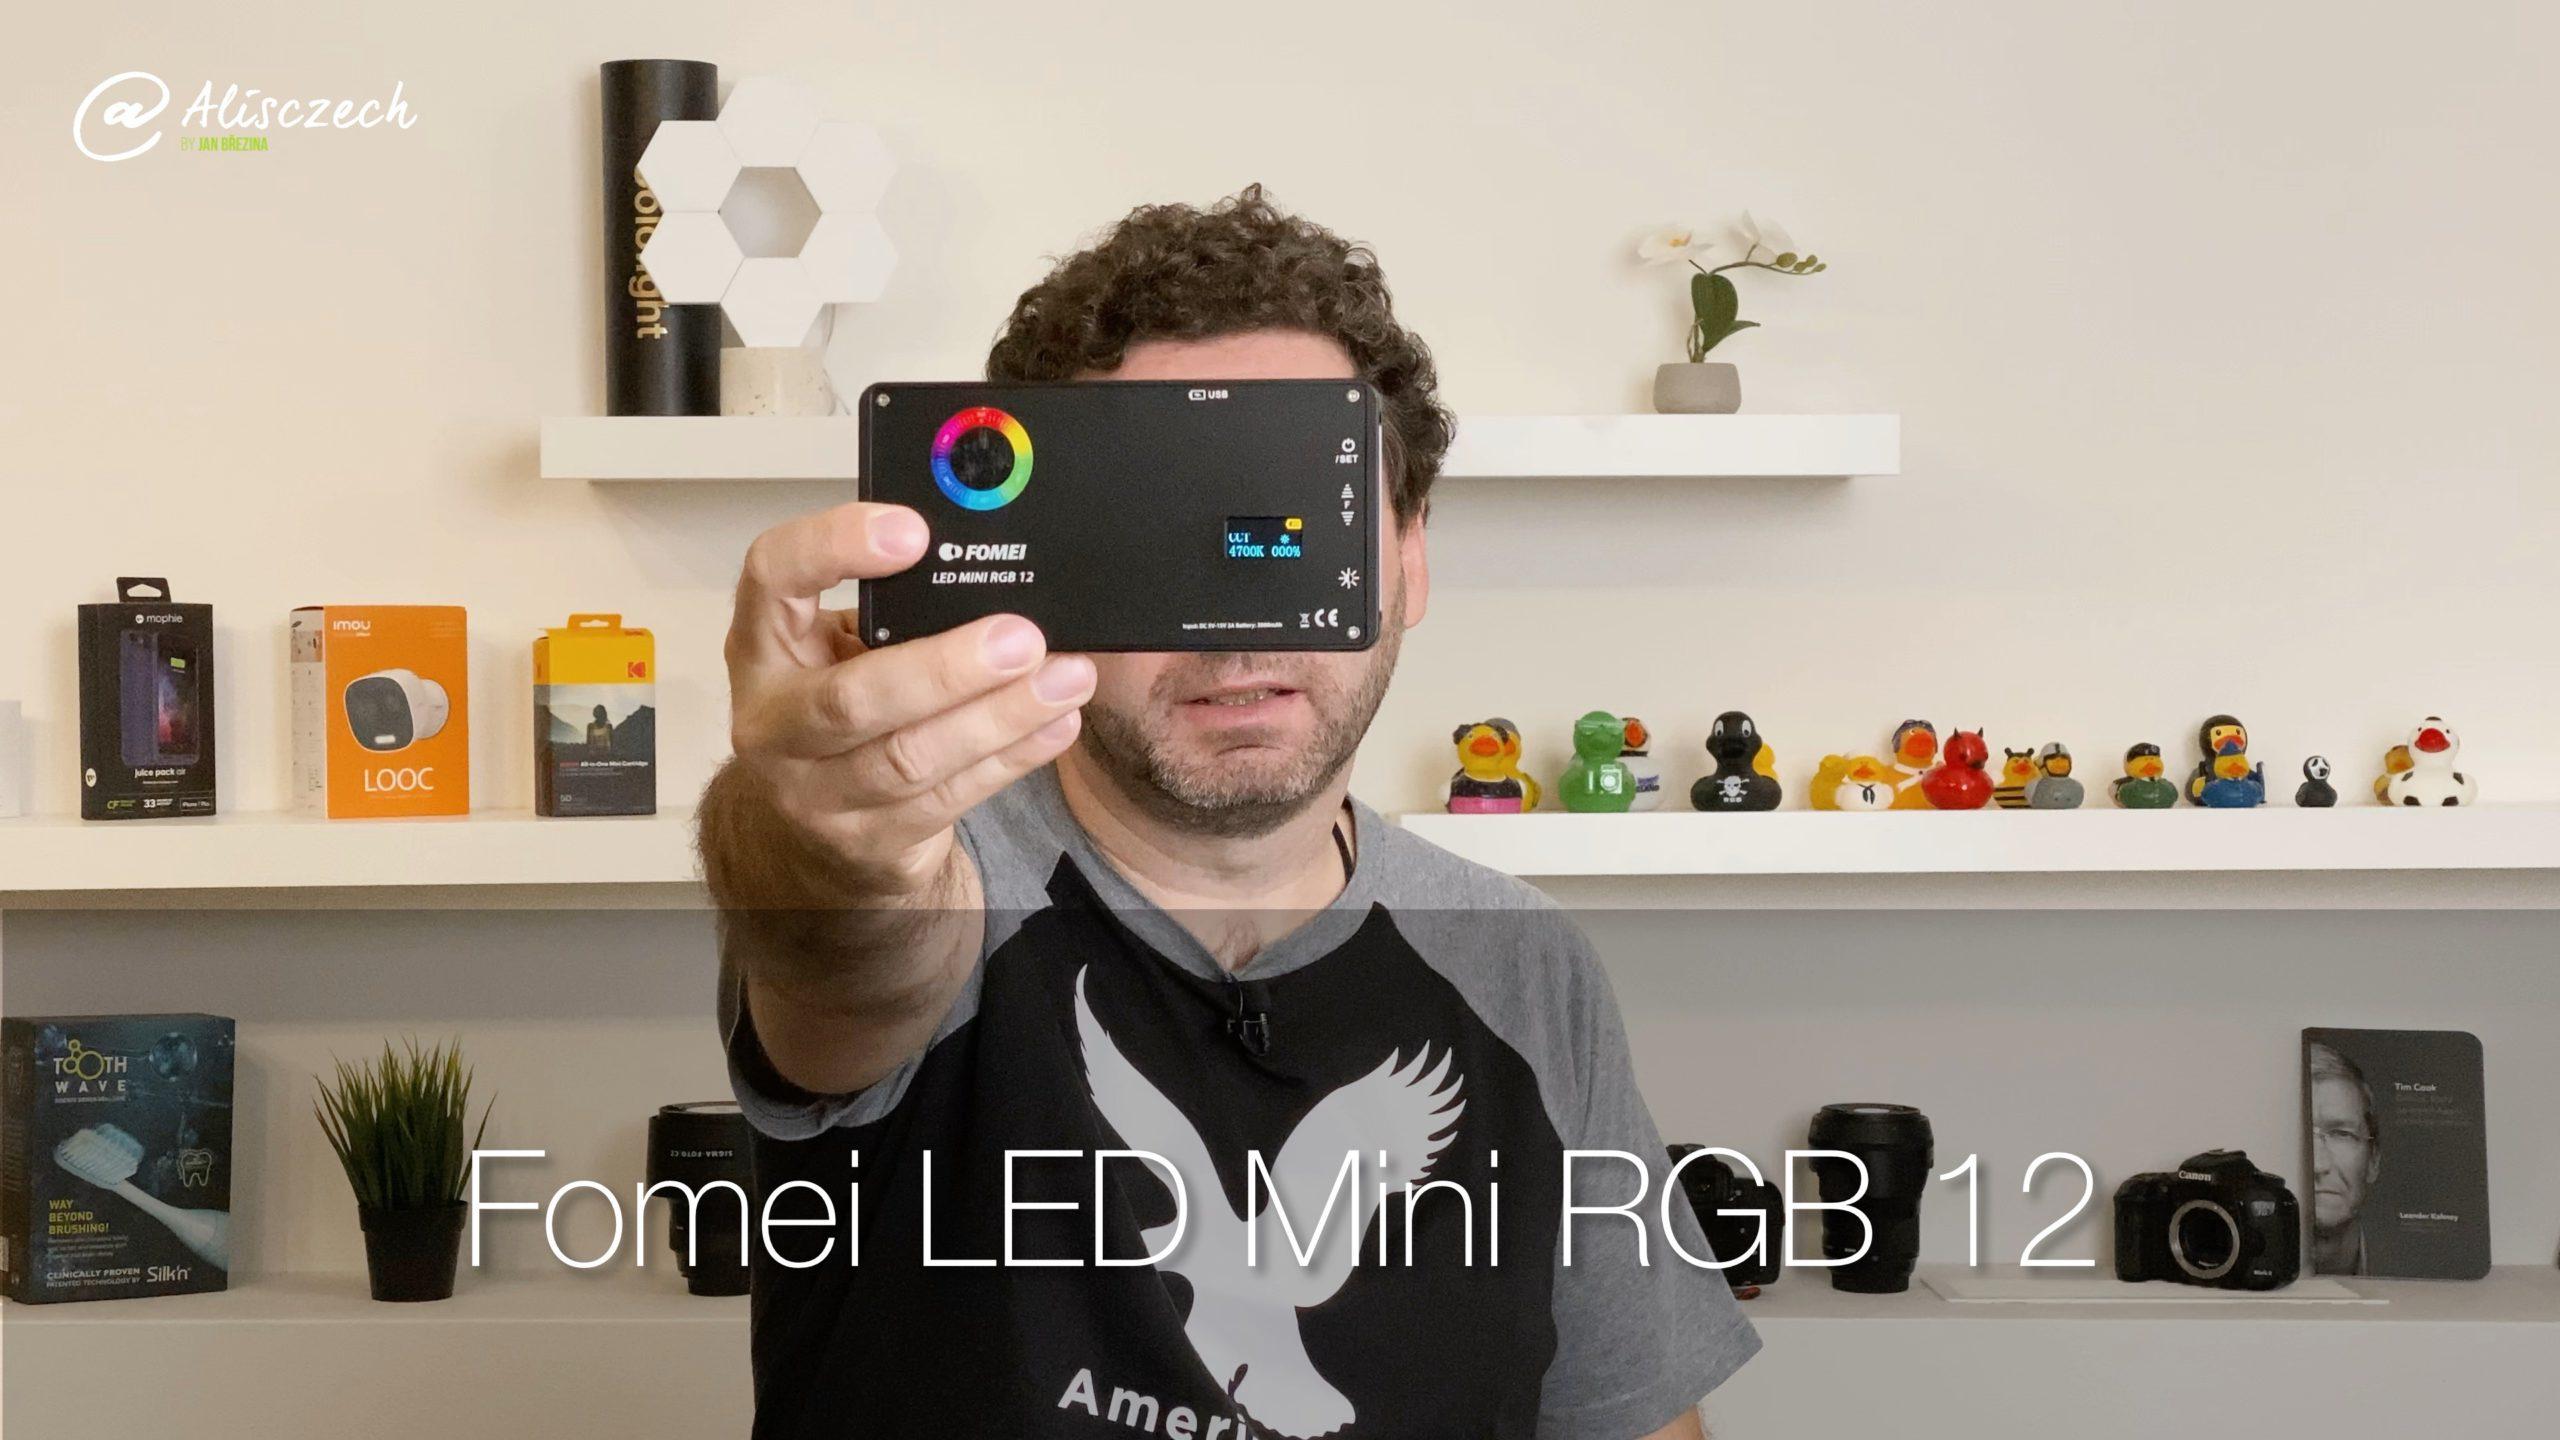 Fomei LED mini RGB 12